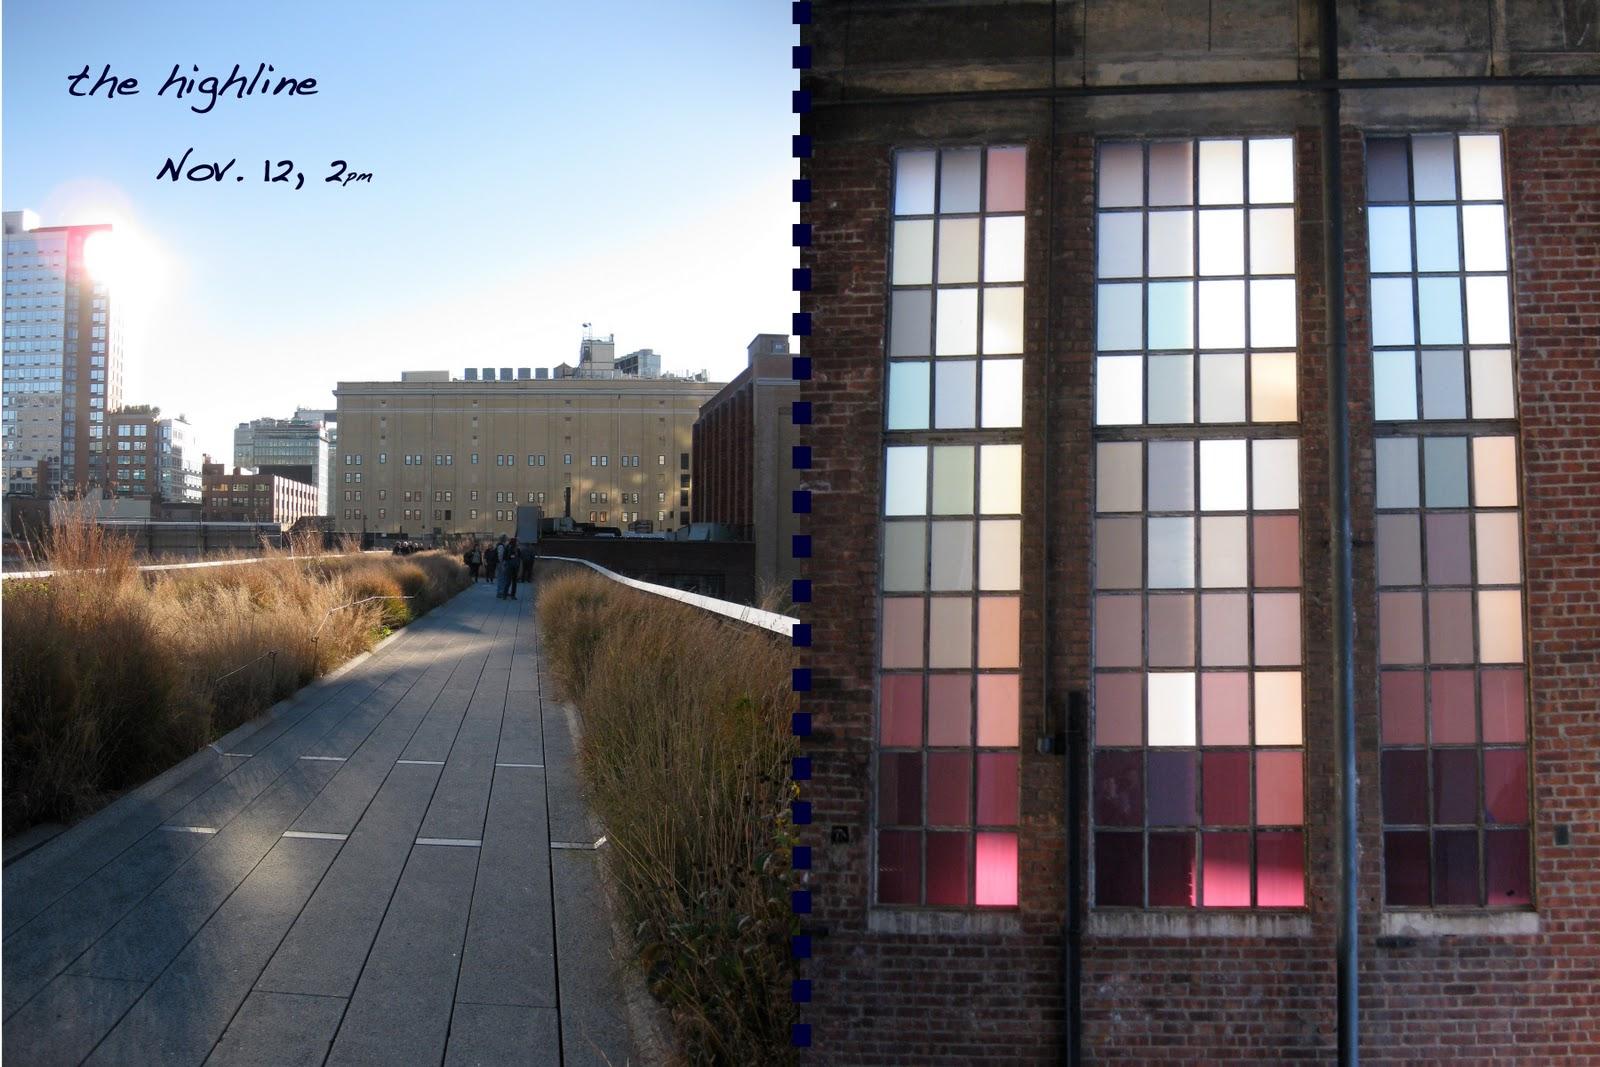 http://3.bp.blogspot.com/_C0HNjcAyGos/TOrY3SKGWYI/AAAAAAAABnY/AaenM26vDYs/s1600/Fig+Studio_highline+park+nyc_1.jpg